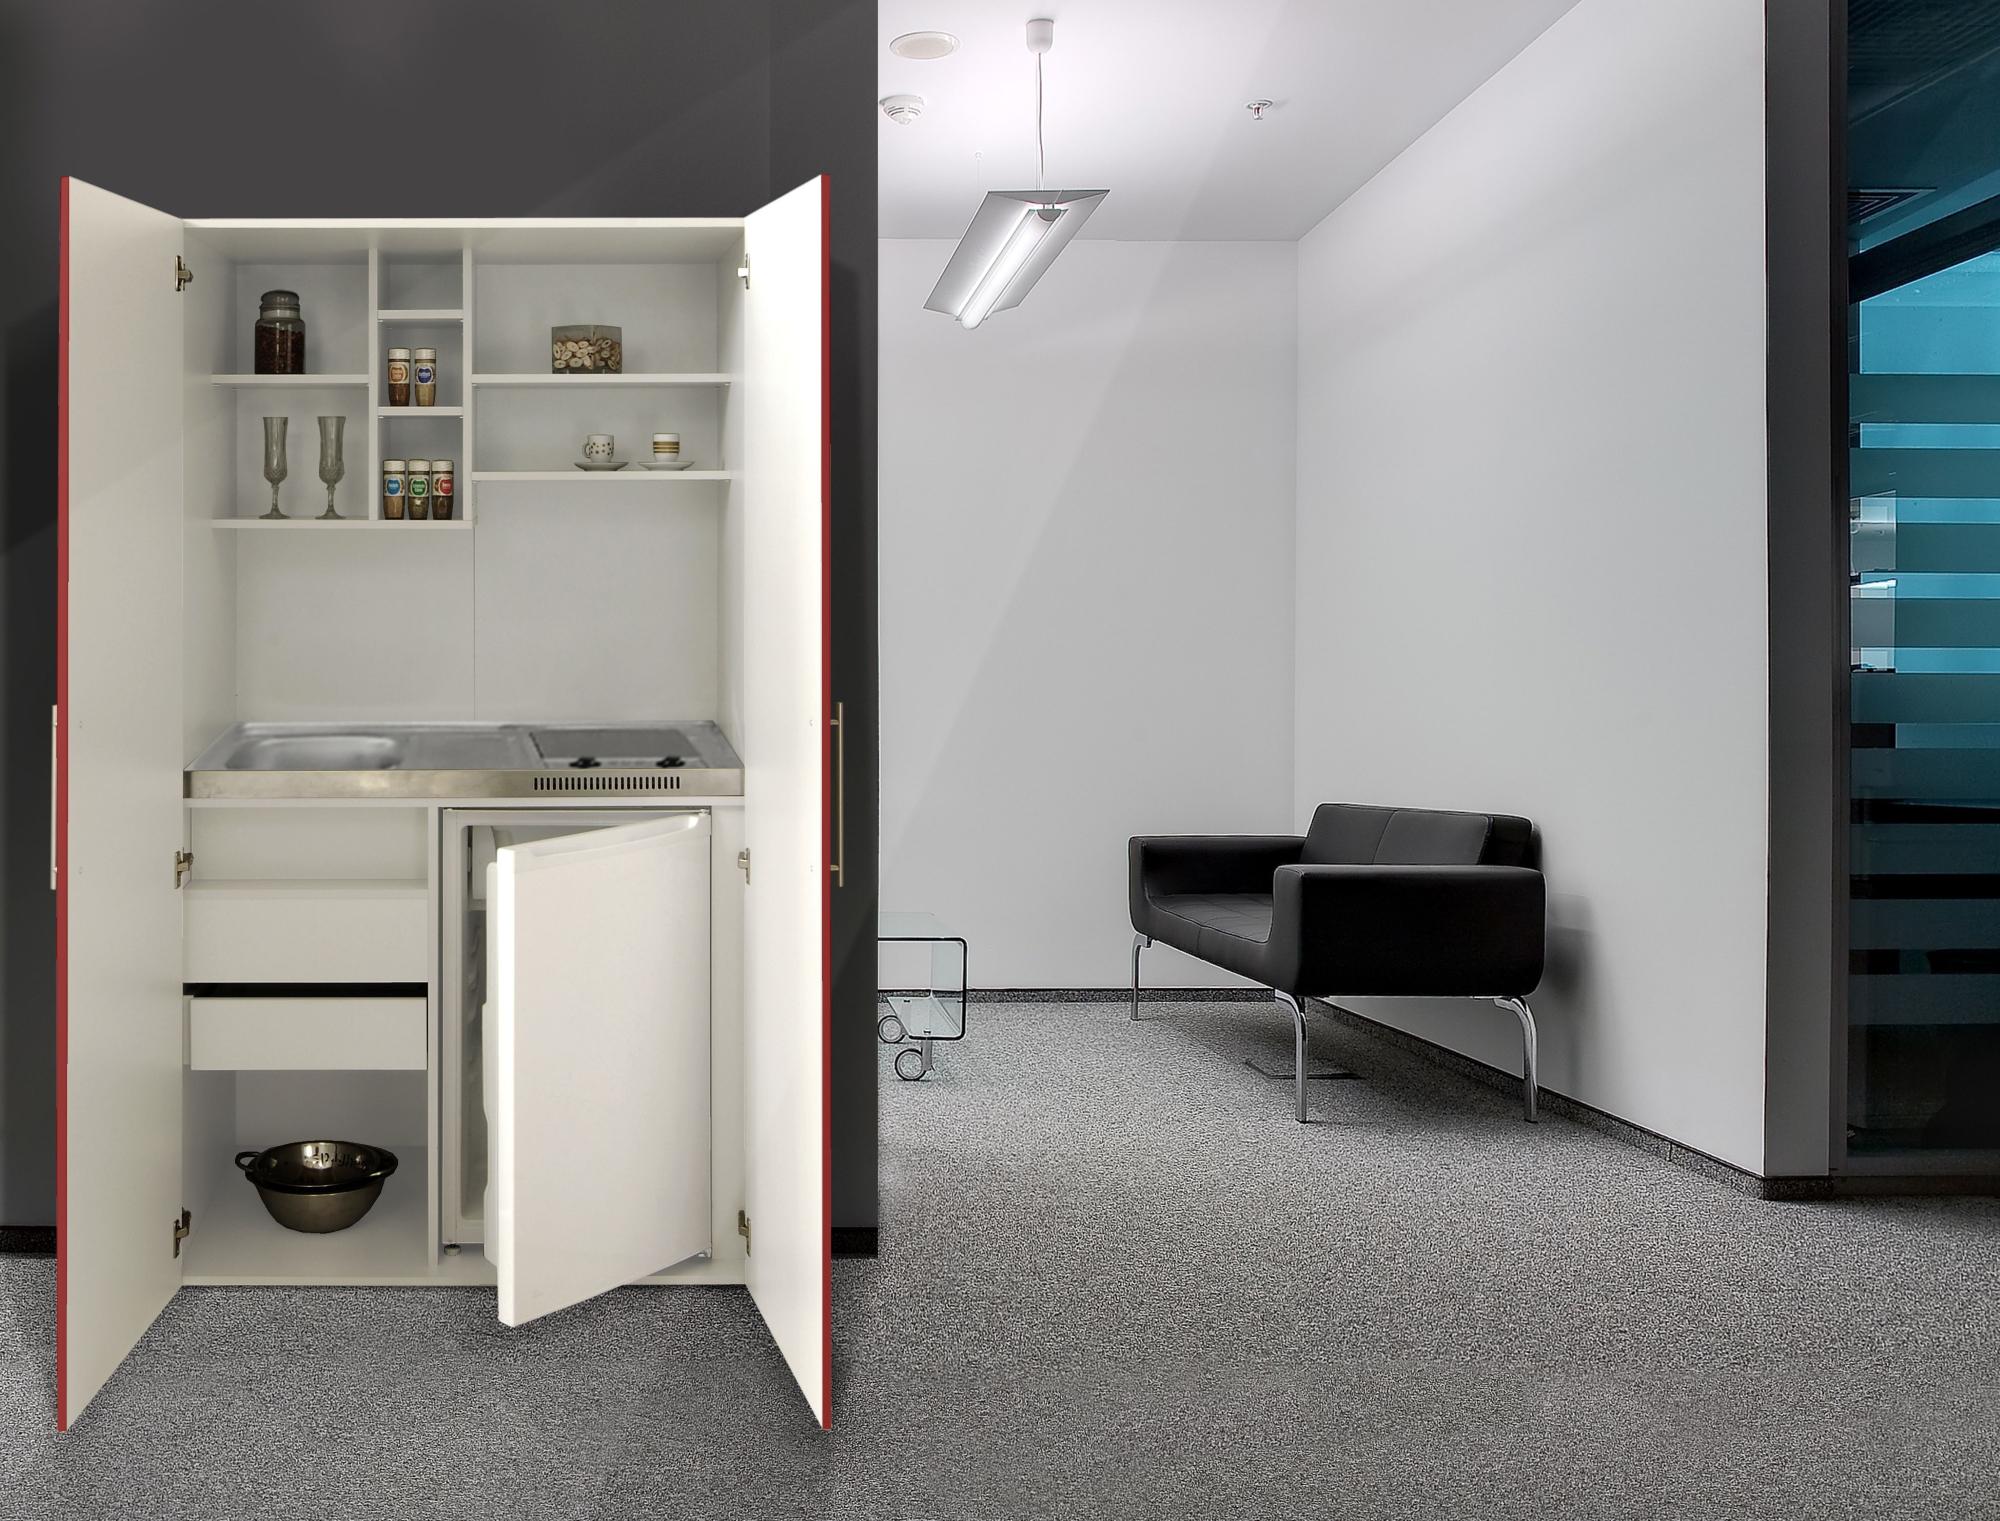 schrankk che k che minik che k chenzeile b ro k chenblock. Black Bedroom Furniture Sets. Home Design Ideas